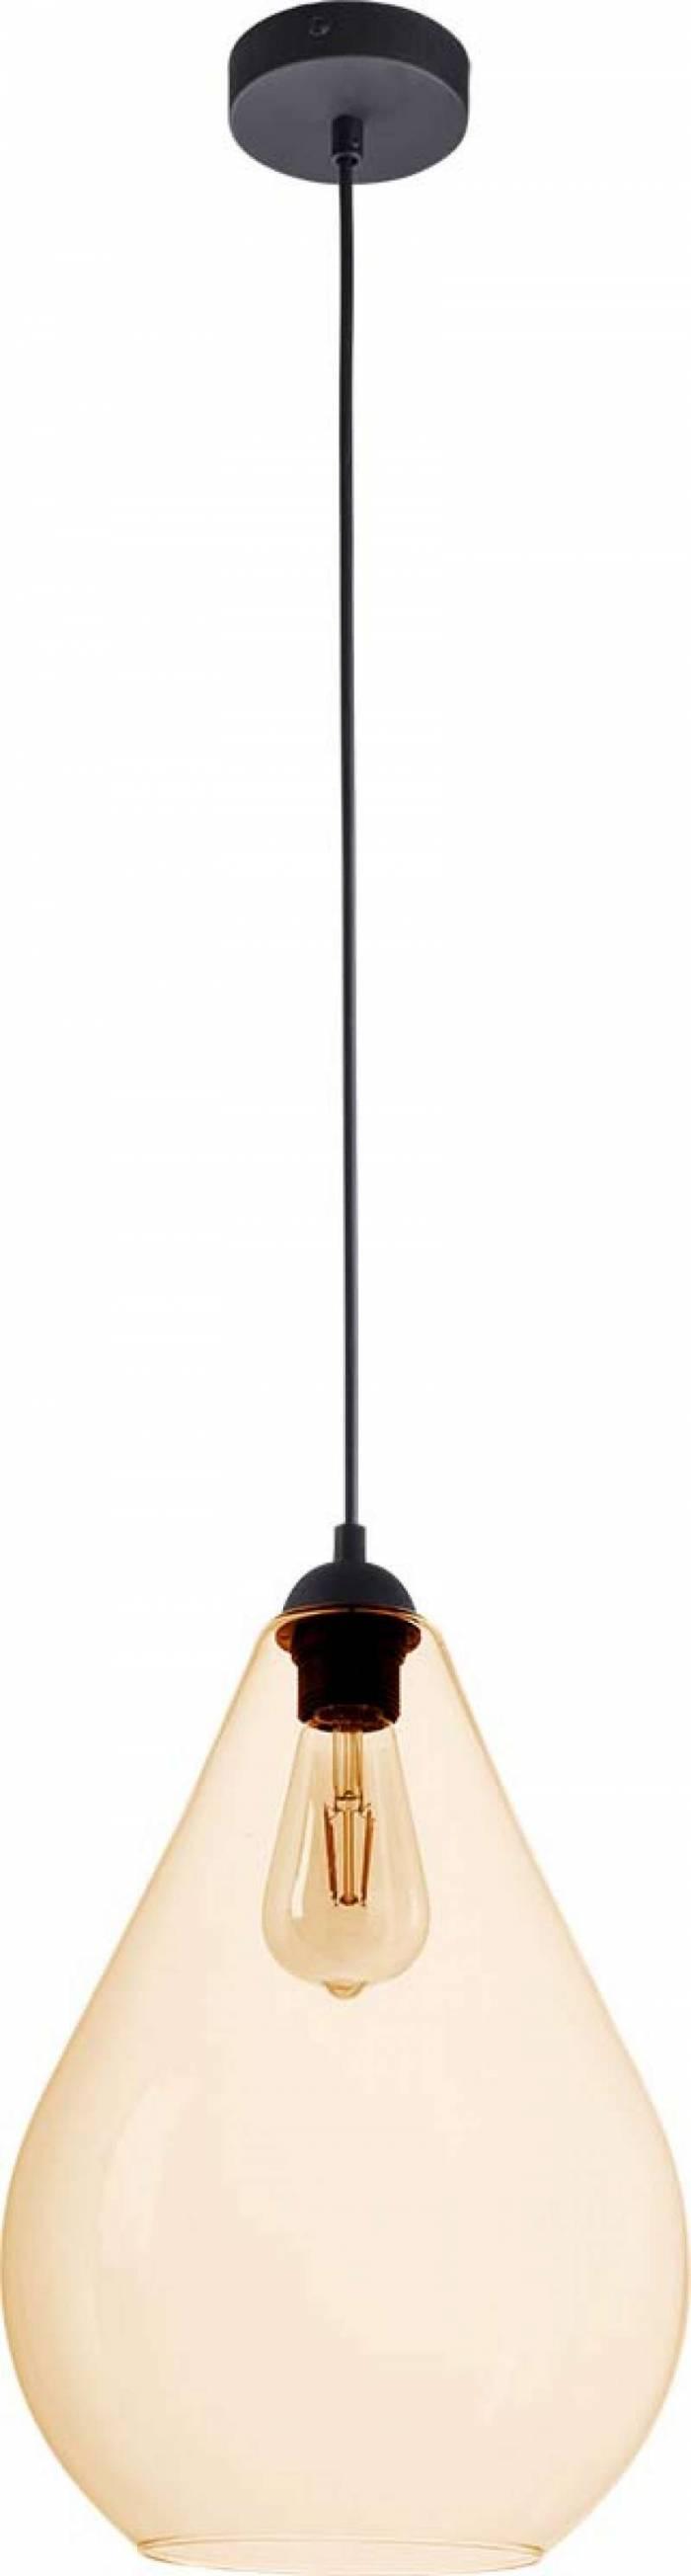 Lustră pendul Violette, 130x24x24 cm, metal/ sticla/ plastic, chihlimbar/ negru